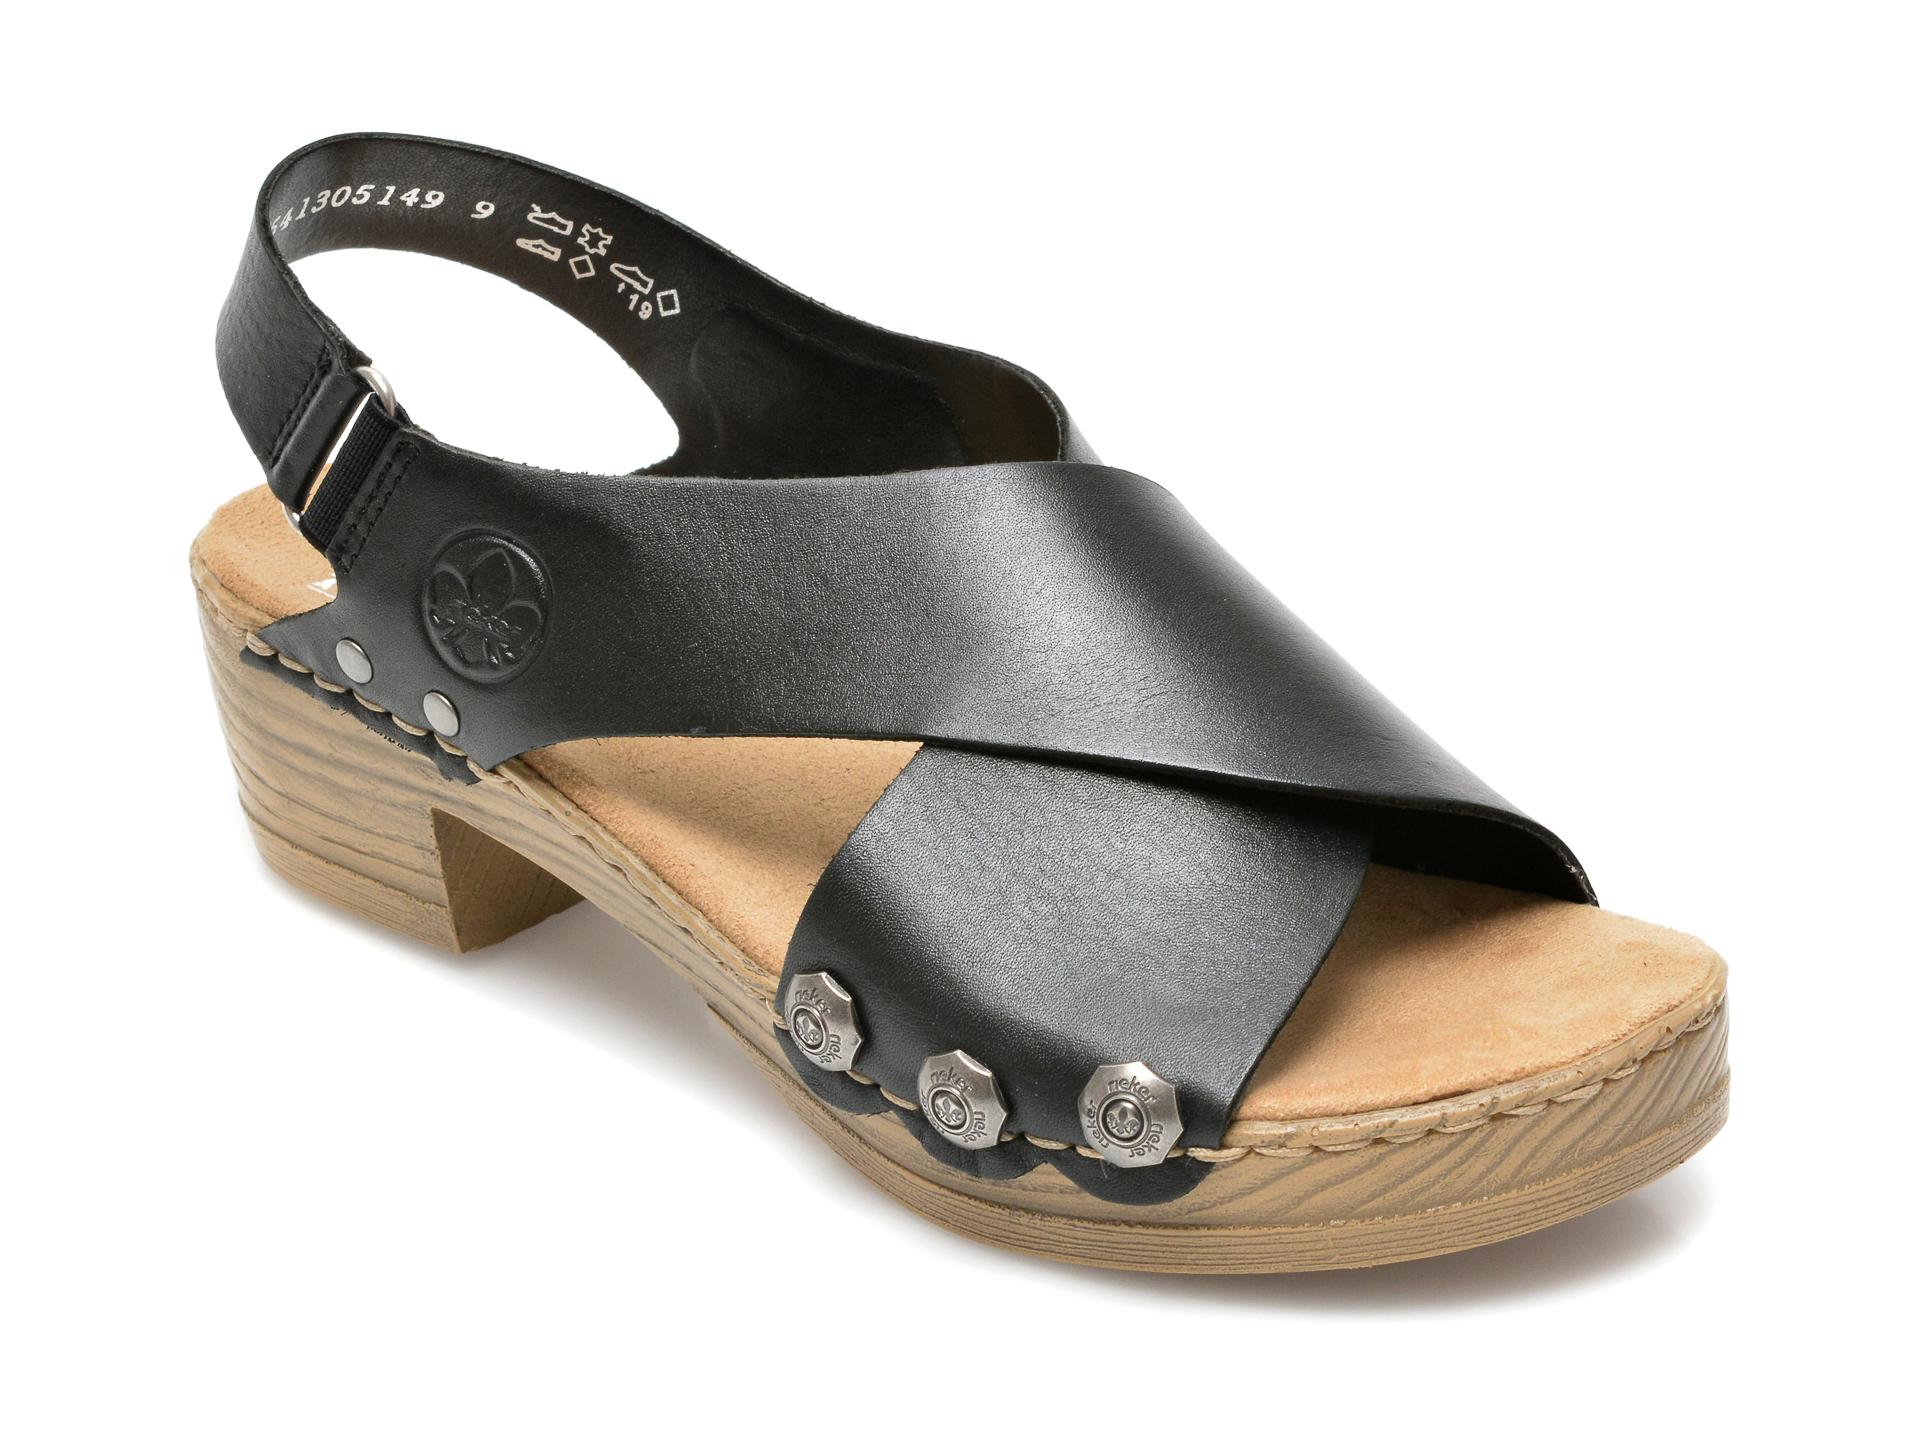 Sandale RIEKER negre, V6888, din piele ecologica